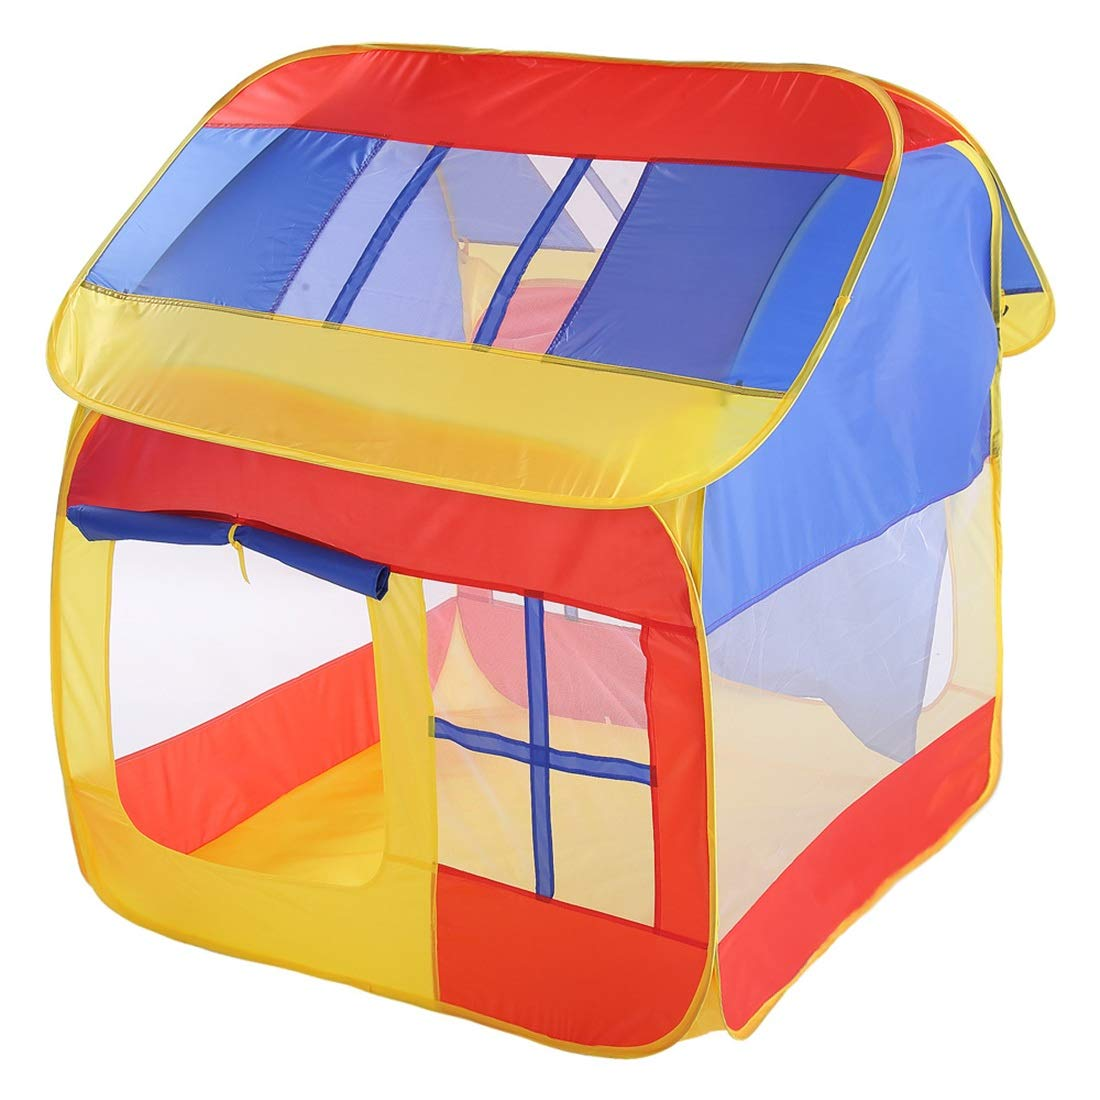 Jakiload Faltbares Kinderspielzelt-Haus-Art-Kinderspielhaus spielt Raum (Farbe : ROT)